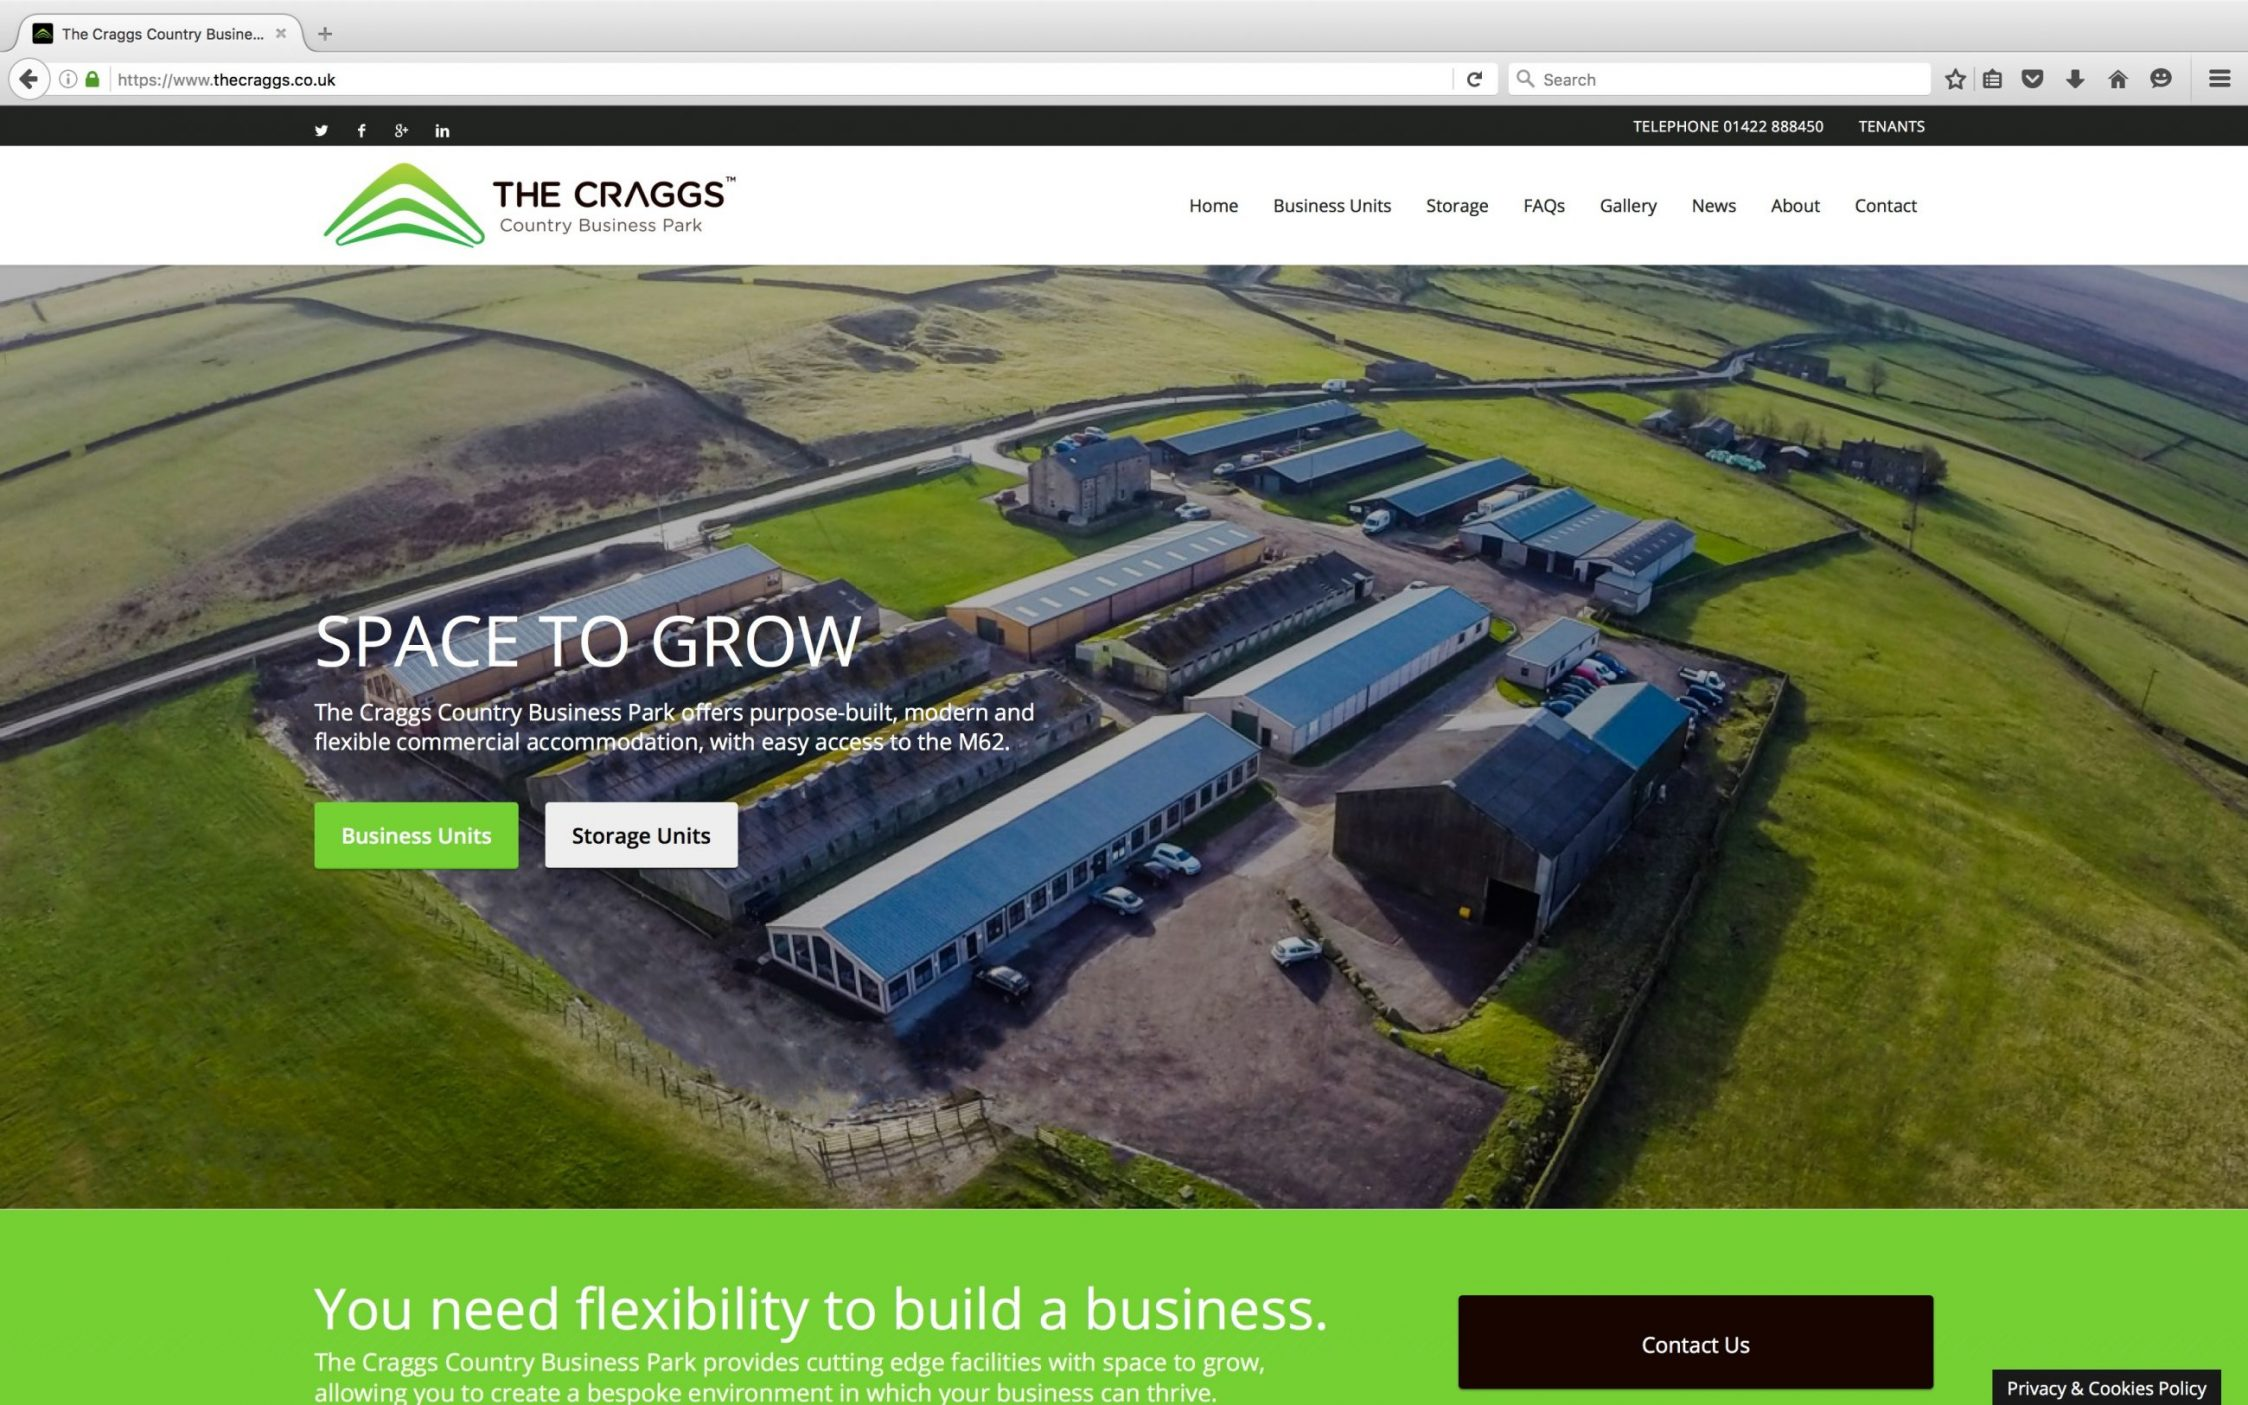 Screen Shot 2016 03 21 at 15.21.48 - Website design for business park in Yorkshire